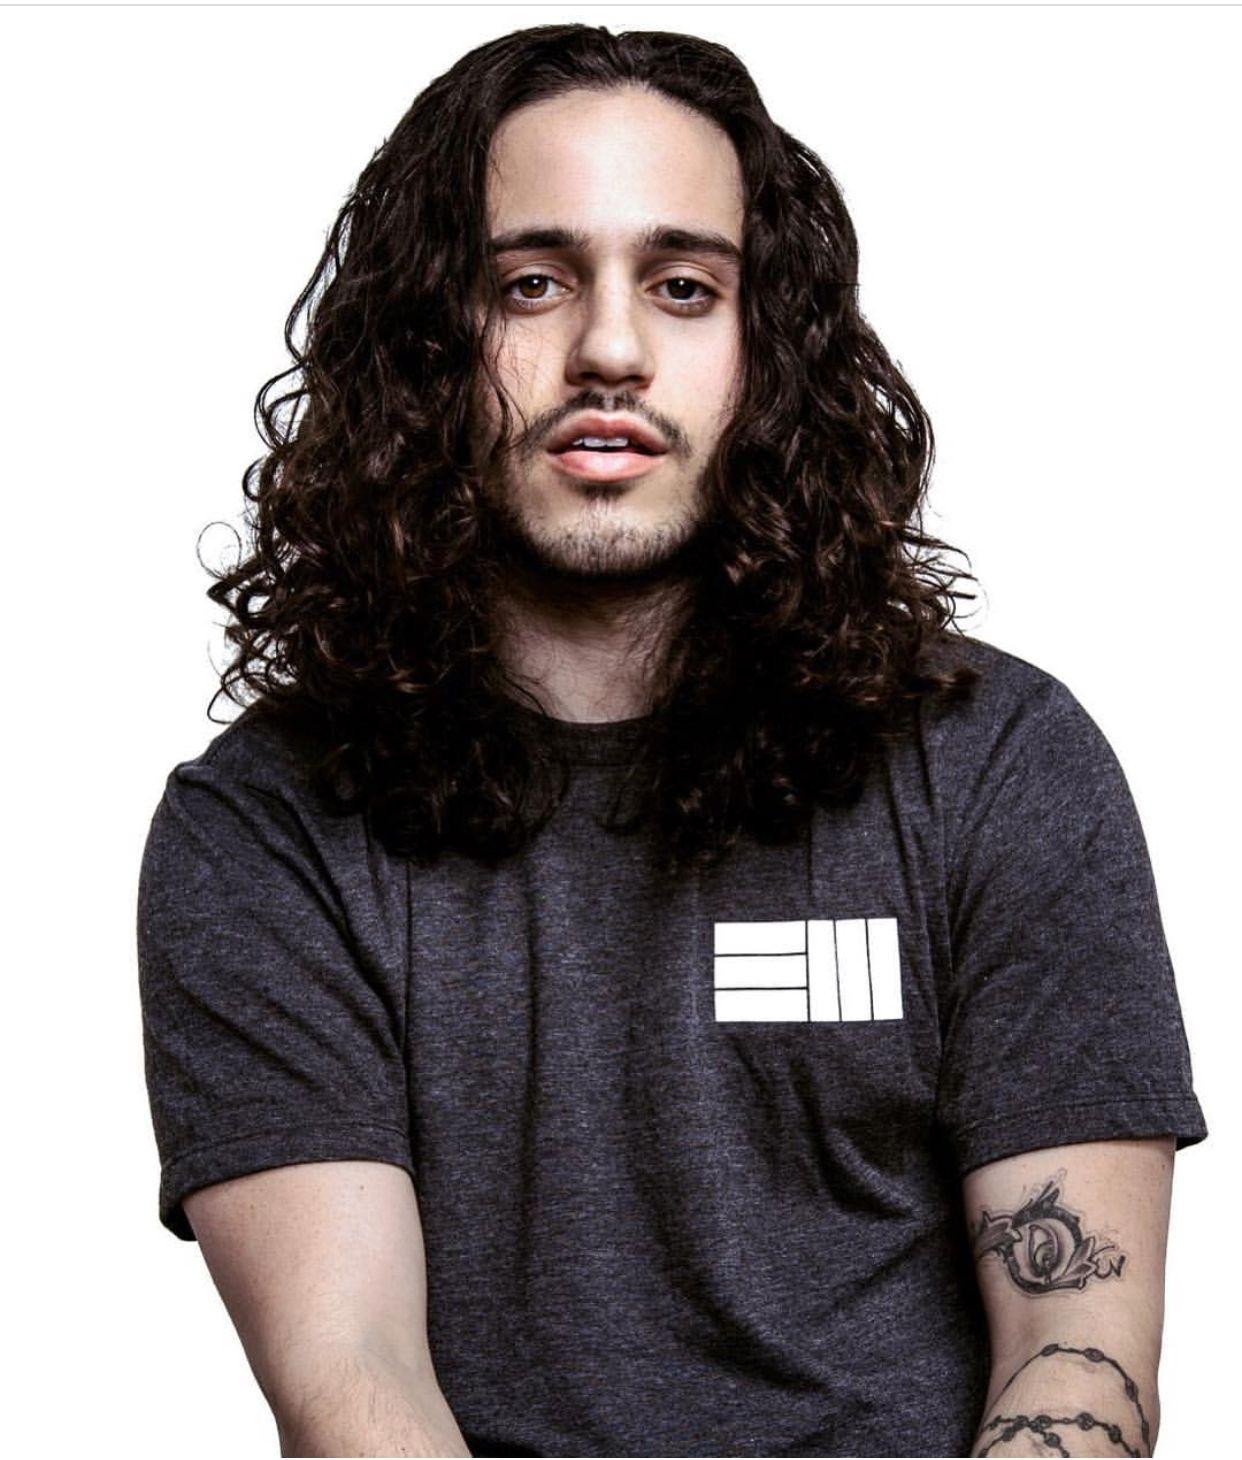 Russ By Cawaa Russ Rapper Long Hair Styles Men Beautiful Men Faces